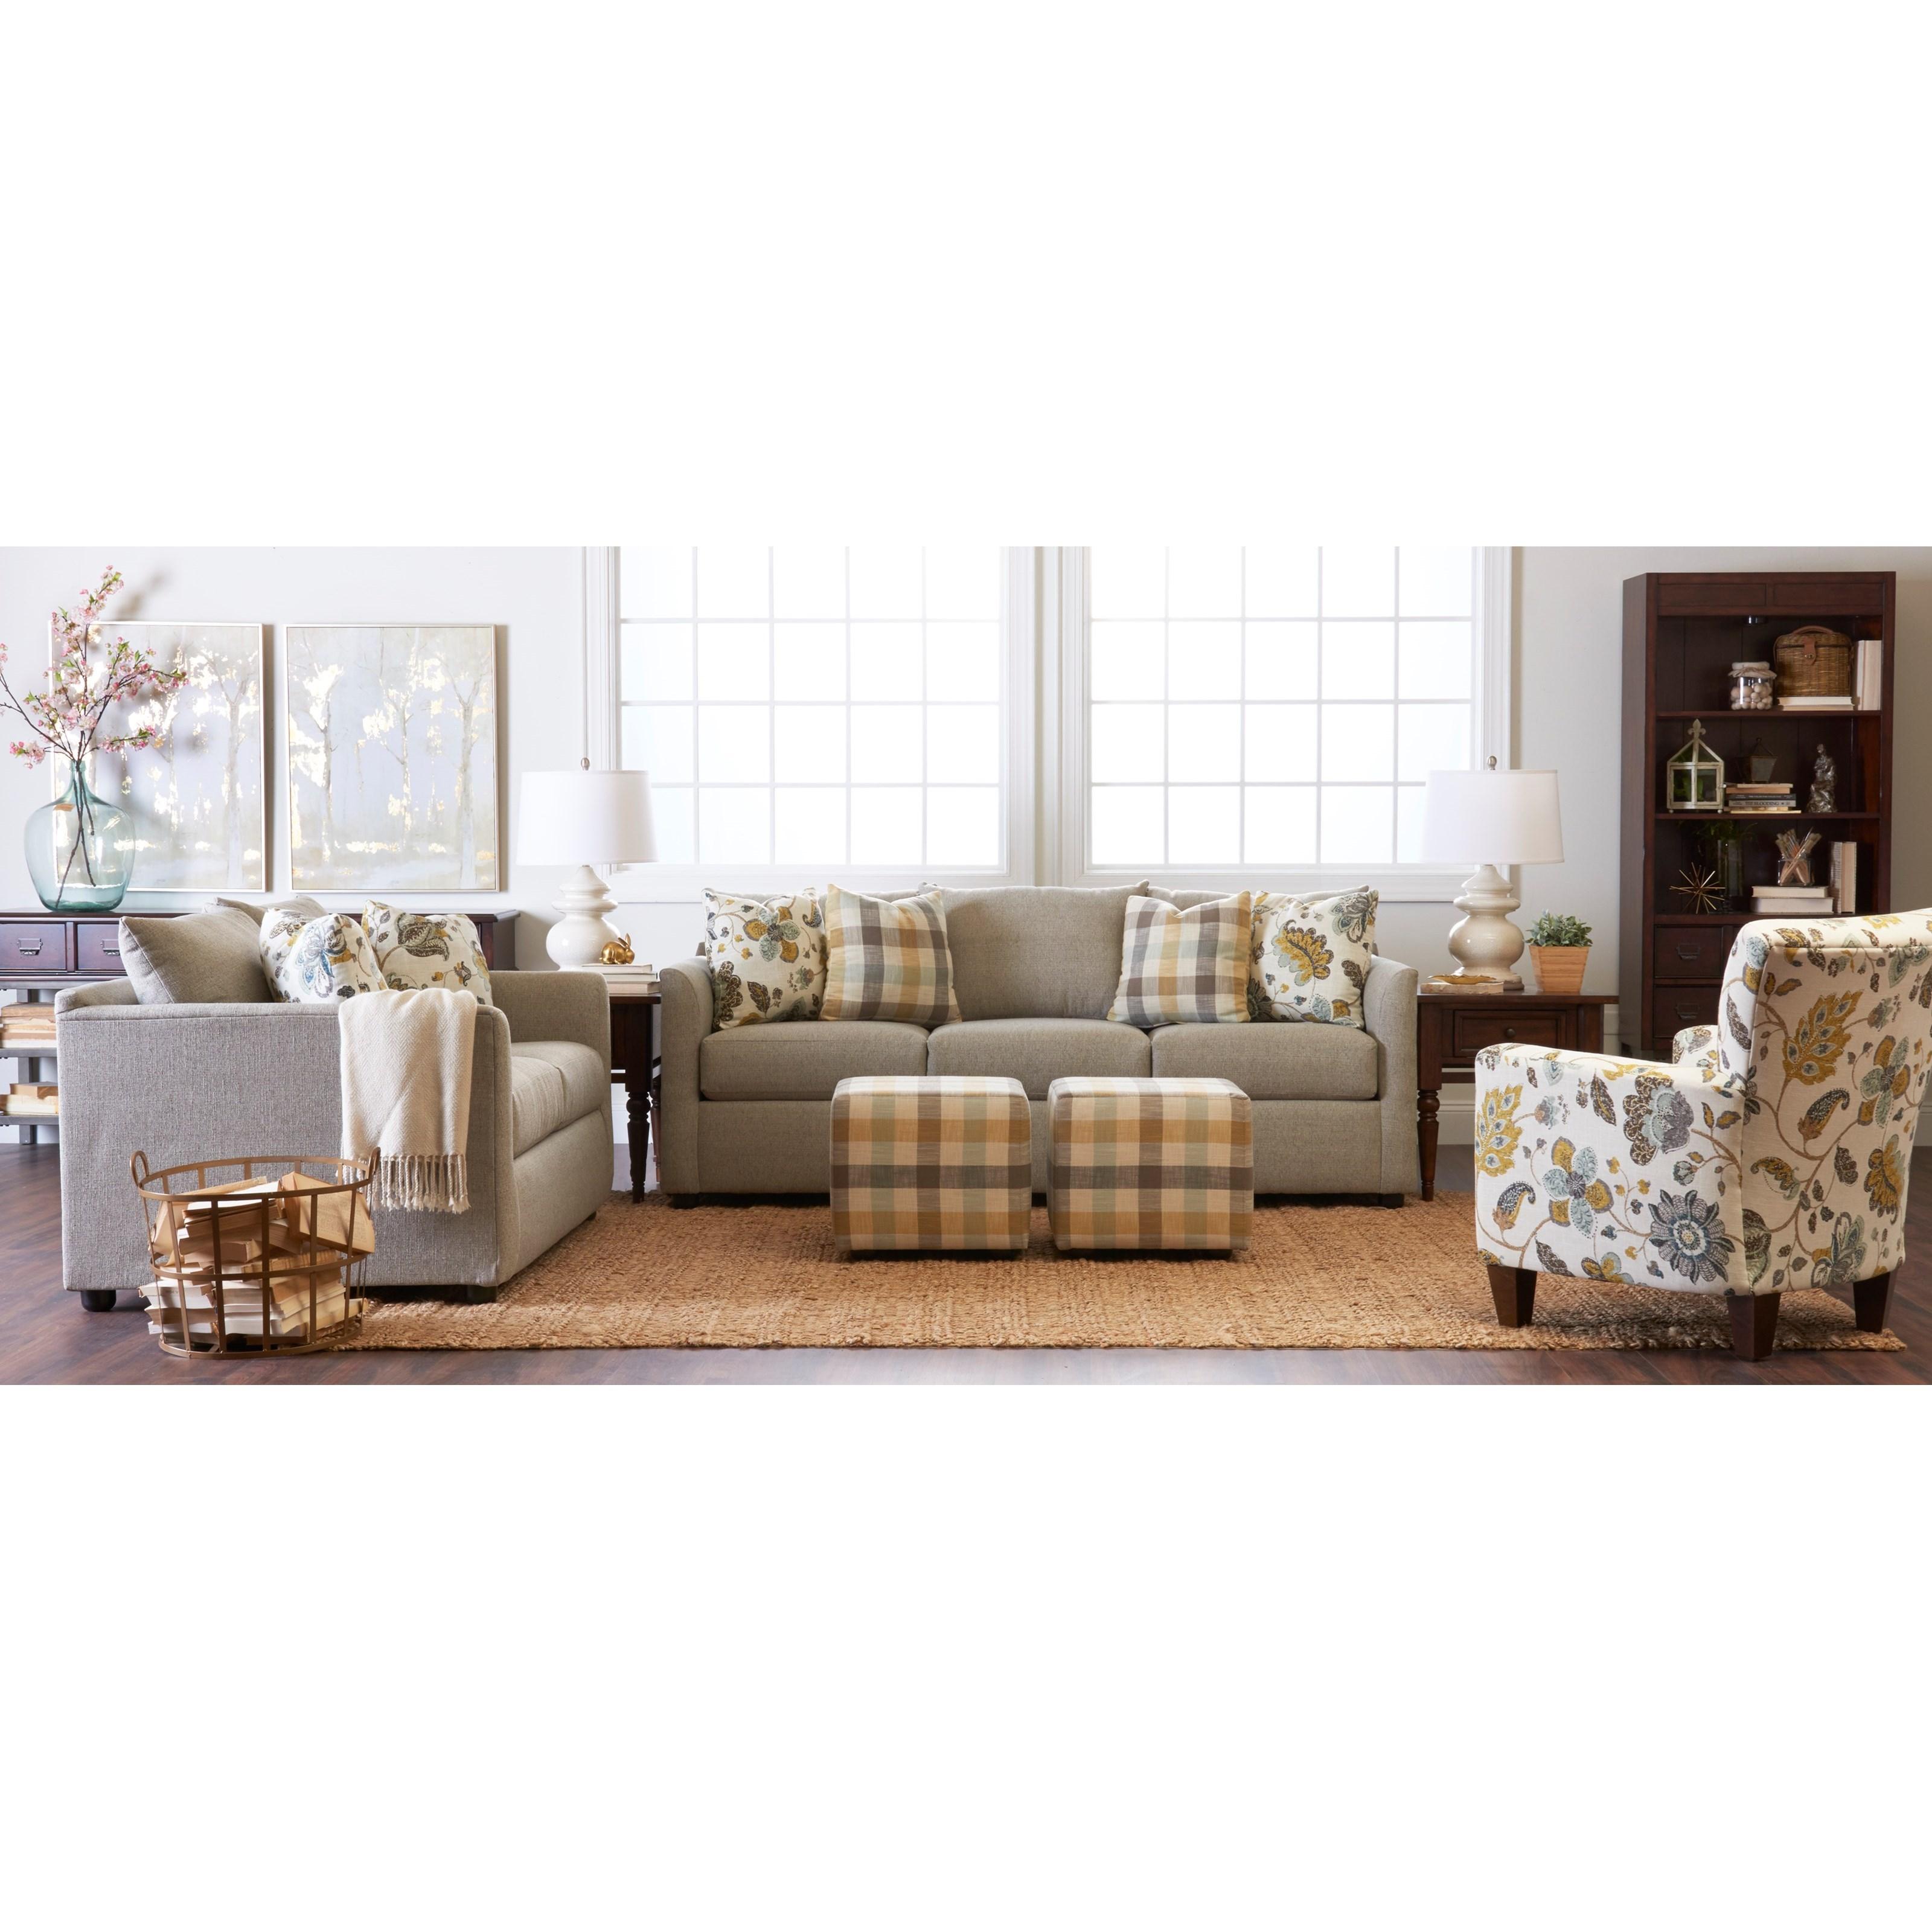 Atlanta Stationary Living Room Group by Klaussner at Johnny Janosik